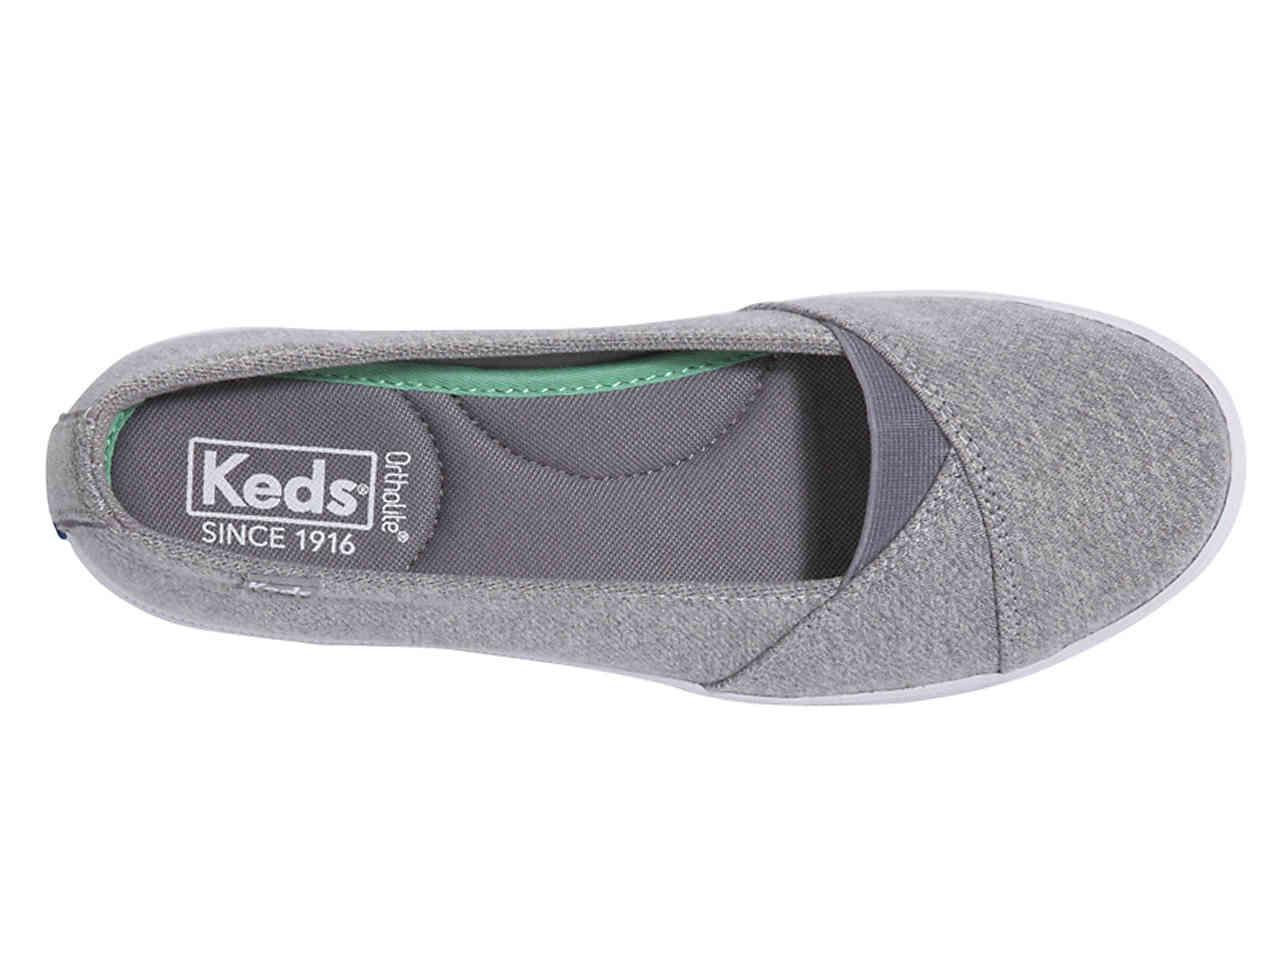 Keds Canvas Cali Sport Flat in Grey